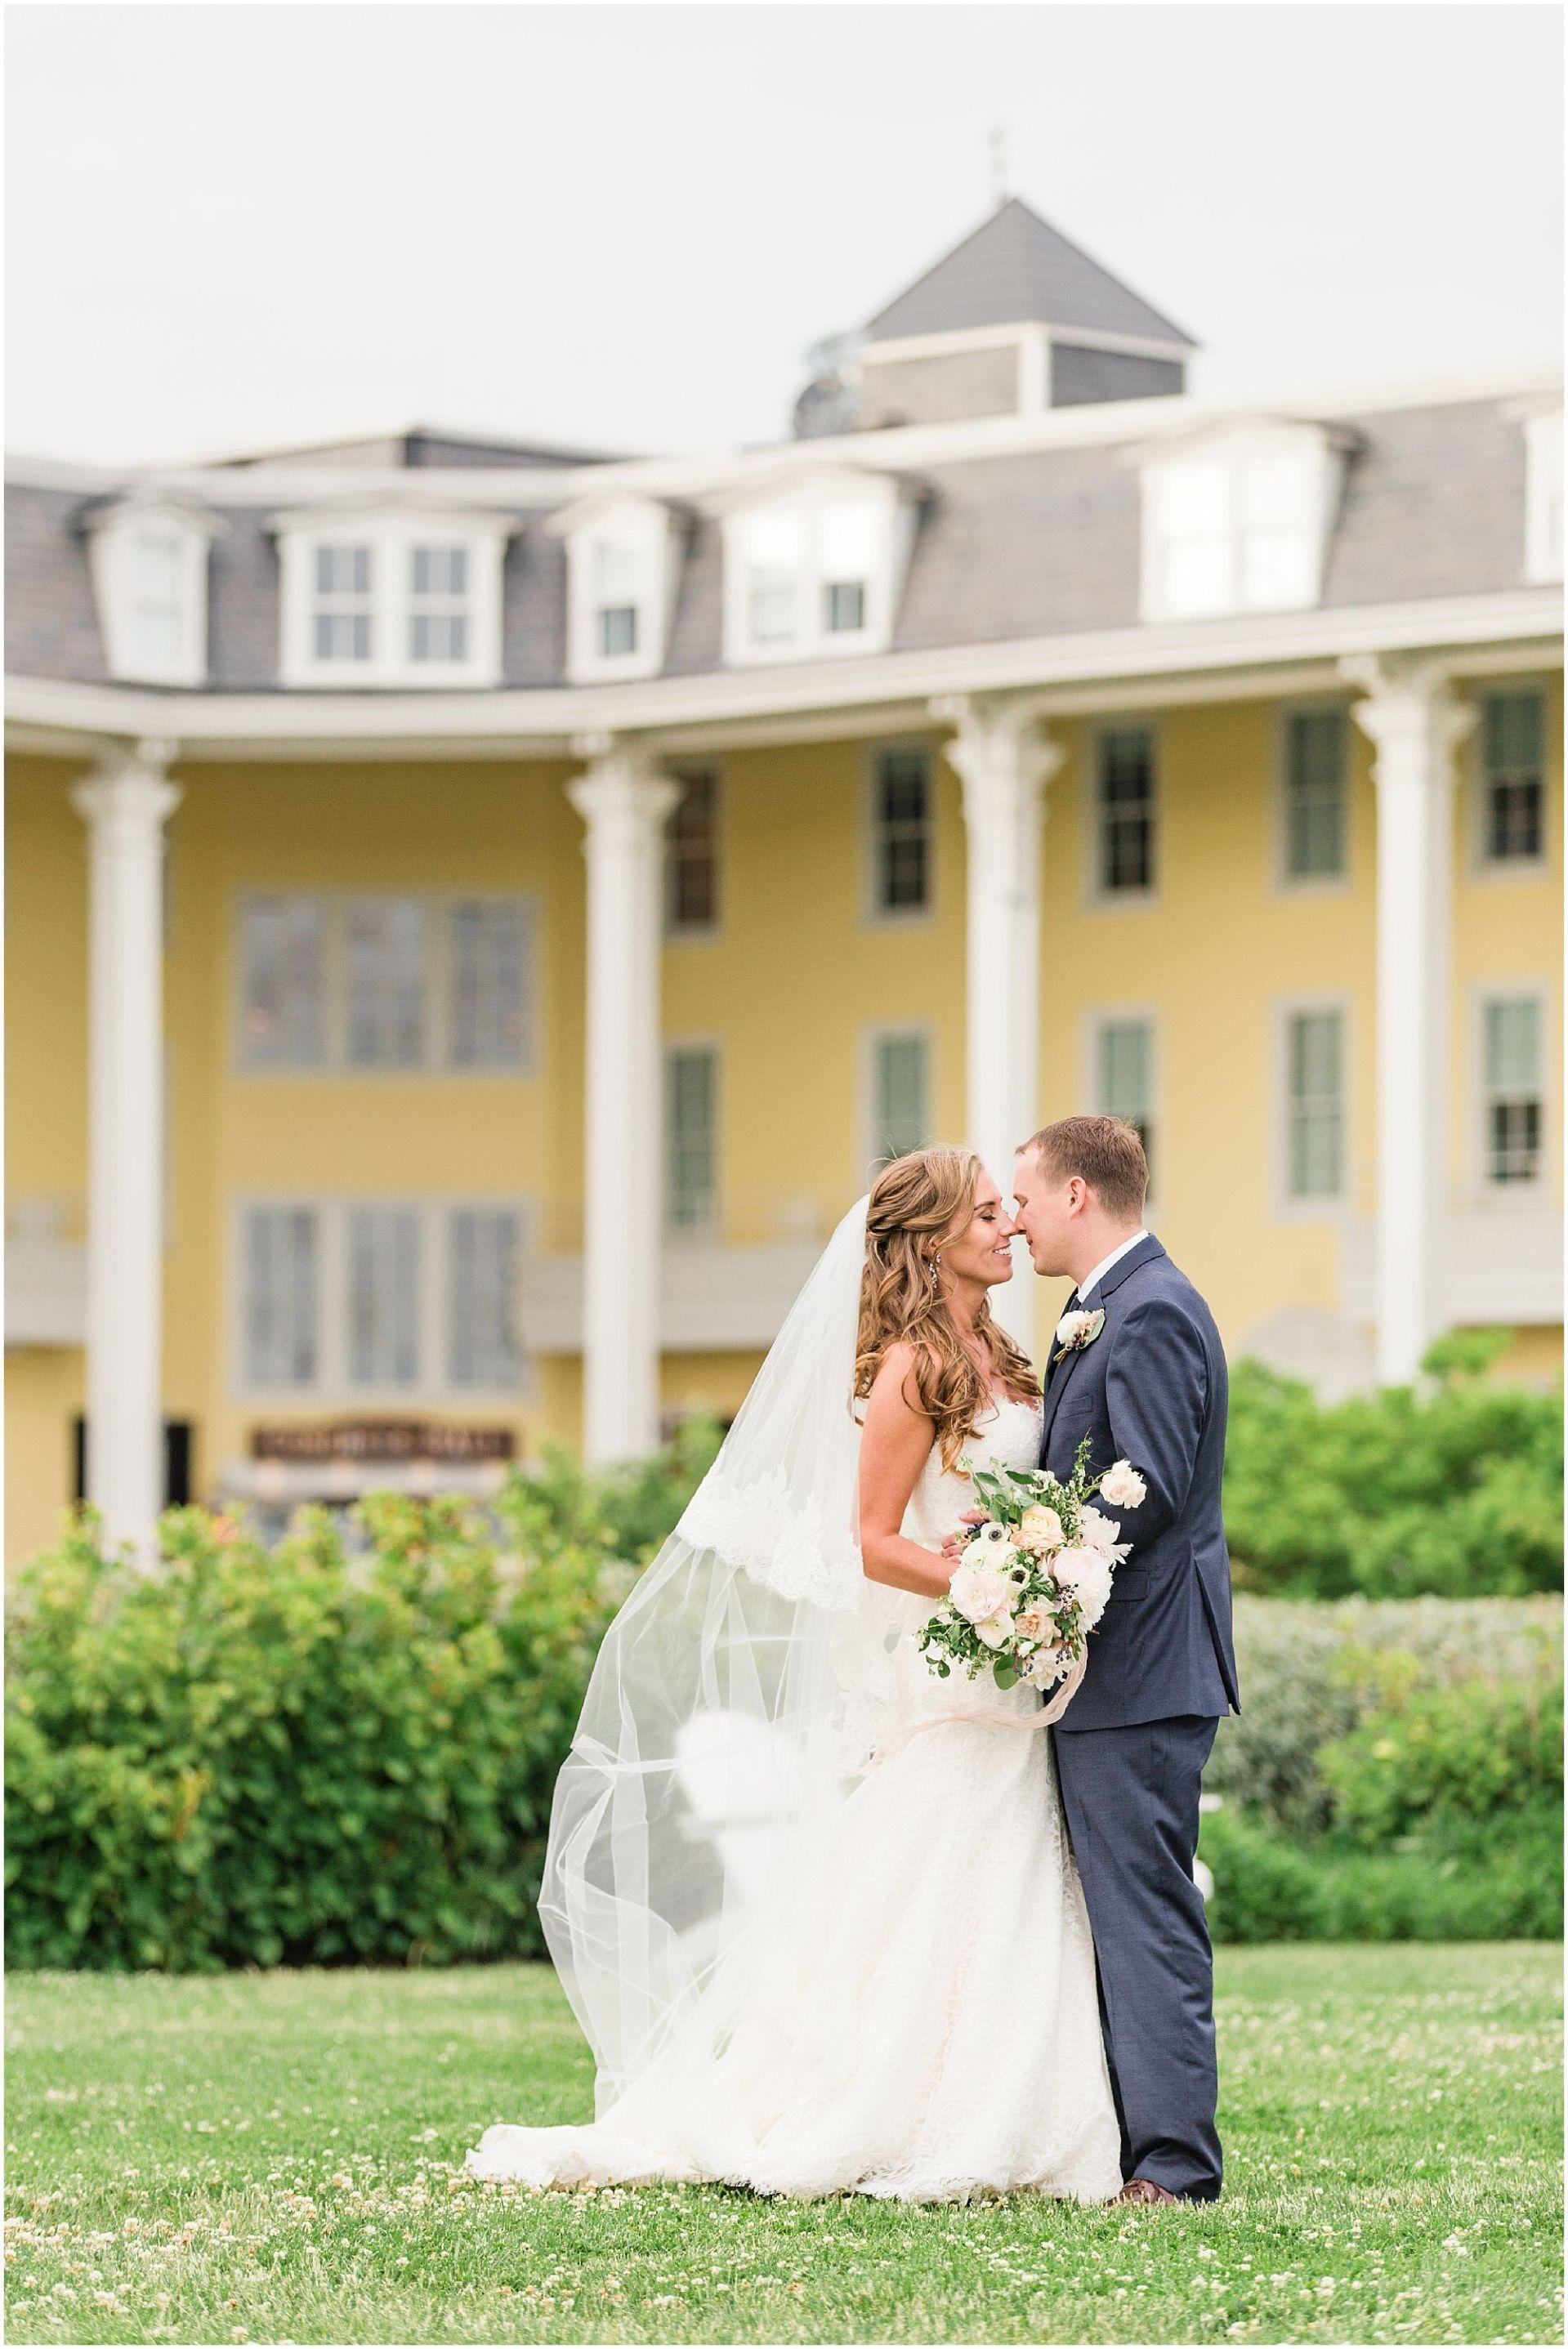 Steve jacquelyns elegant cape may wedding wedding